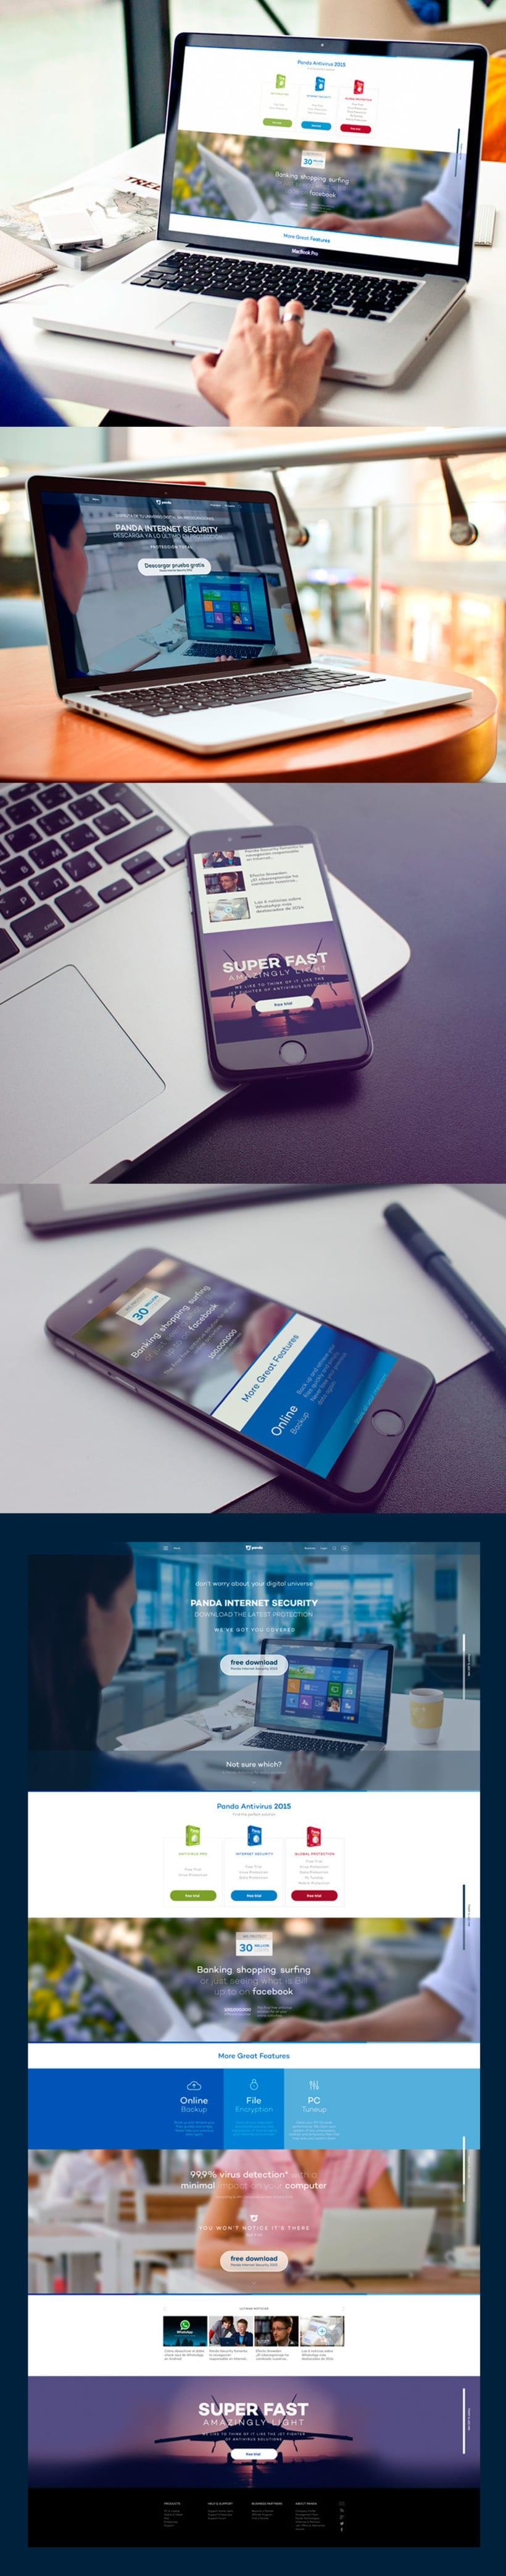 Panda Security - Web design -1